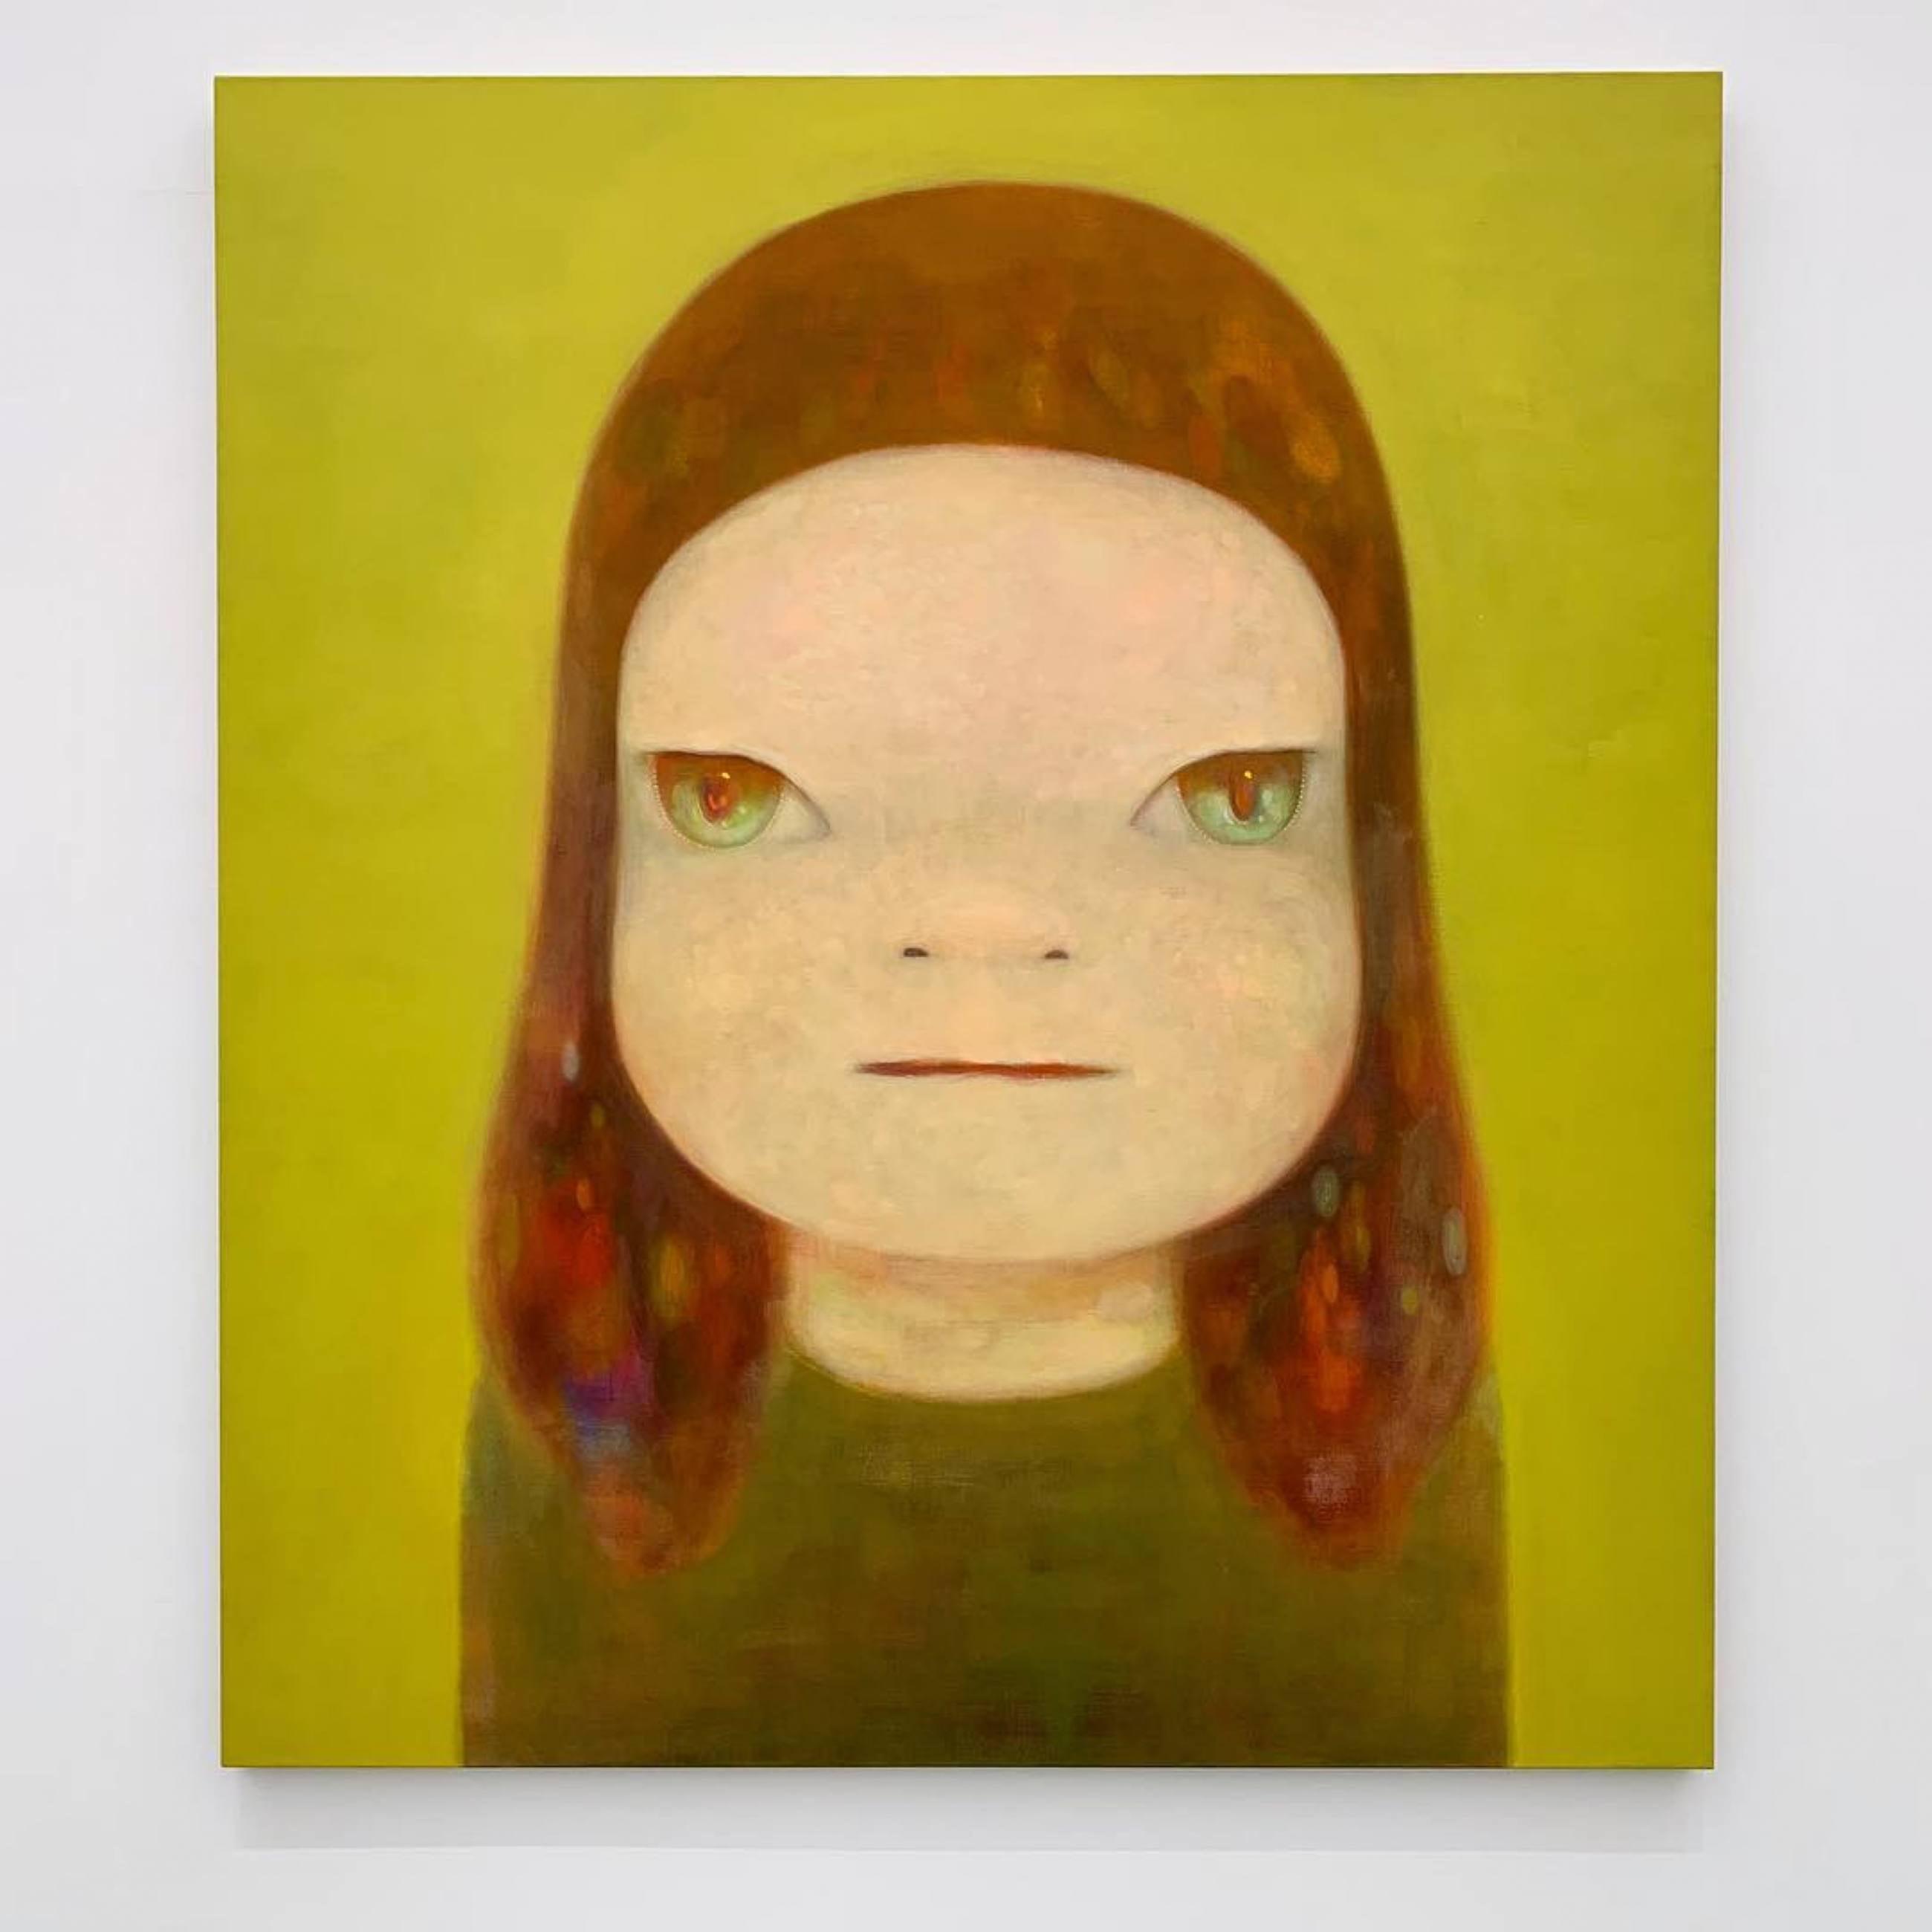 Portrait painting by Yoshitomo Nara on display at N's YARD in Japan